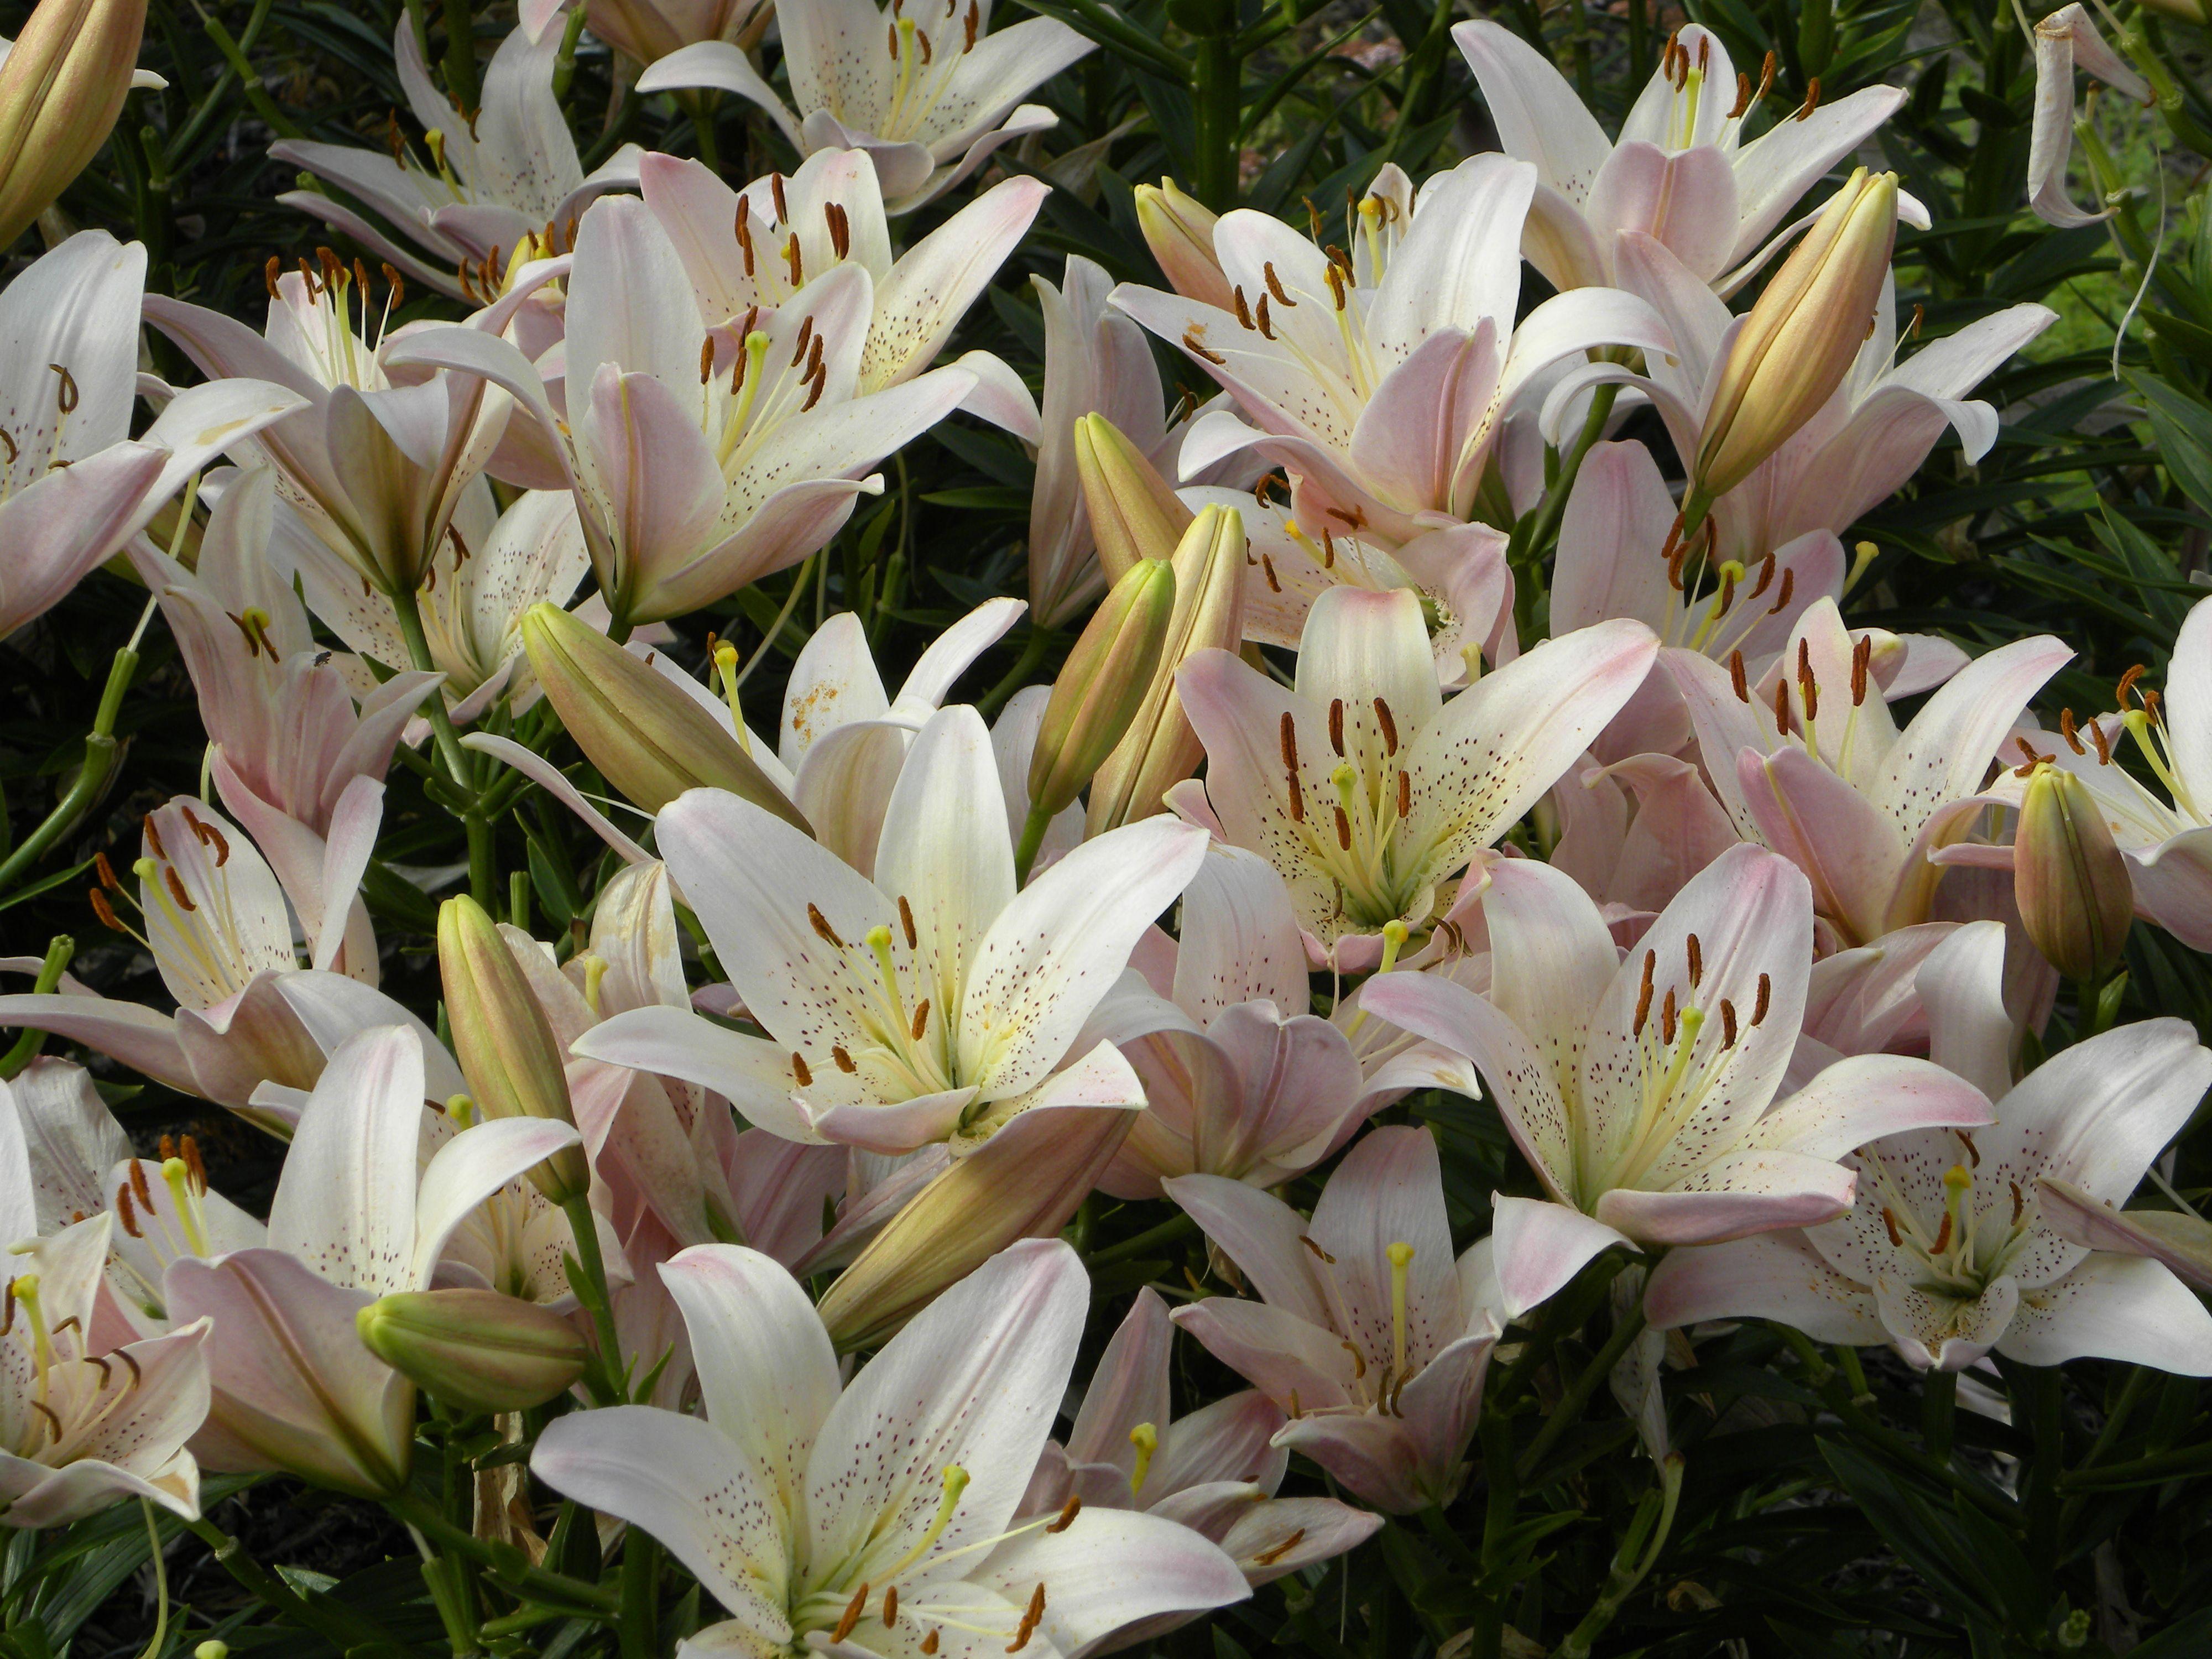 Backyard lilies cest tres belle pinterest backyard flower backyard lilies izmirmasajfo